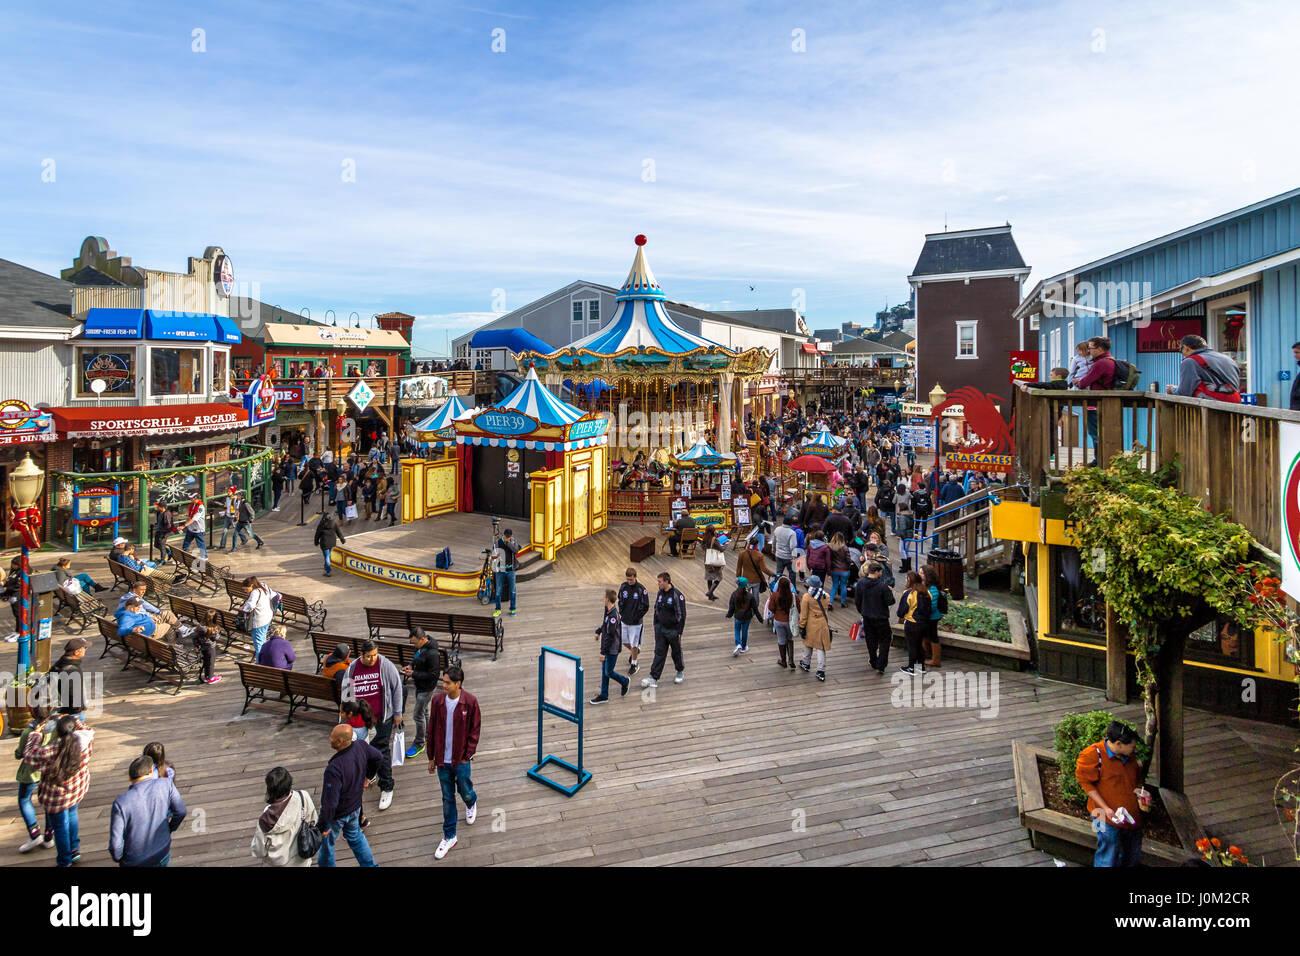 pier-39-stores-and-carousel-in-fishermans-wharf-san-francisco-california-J0M2CR.jpg